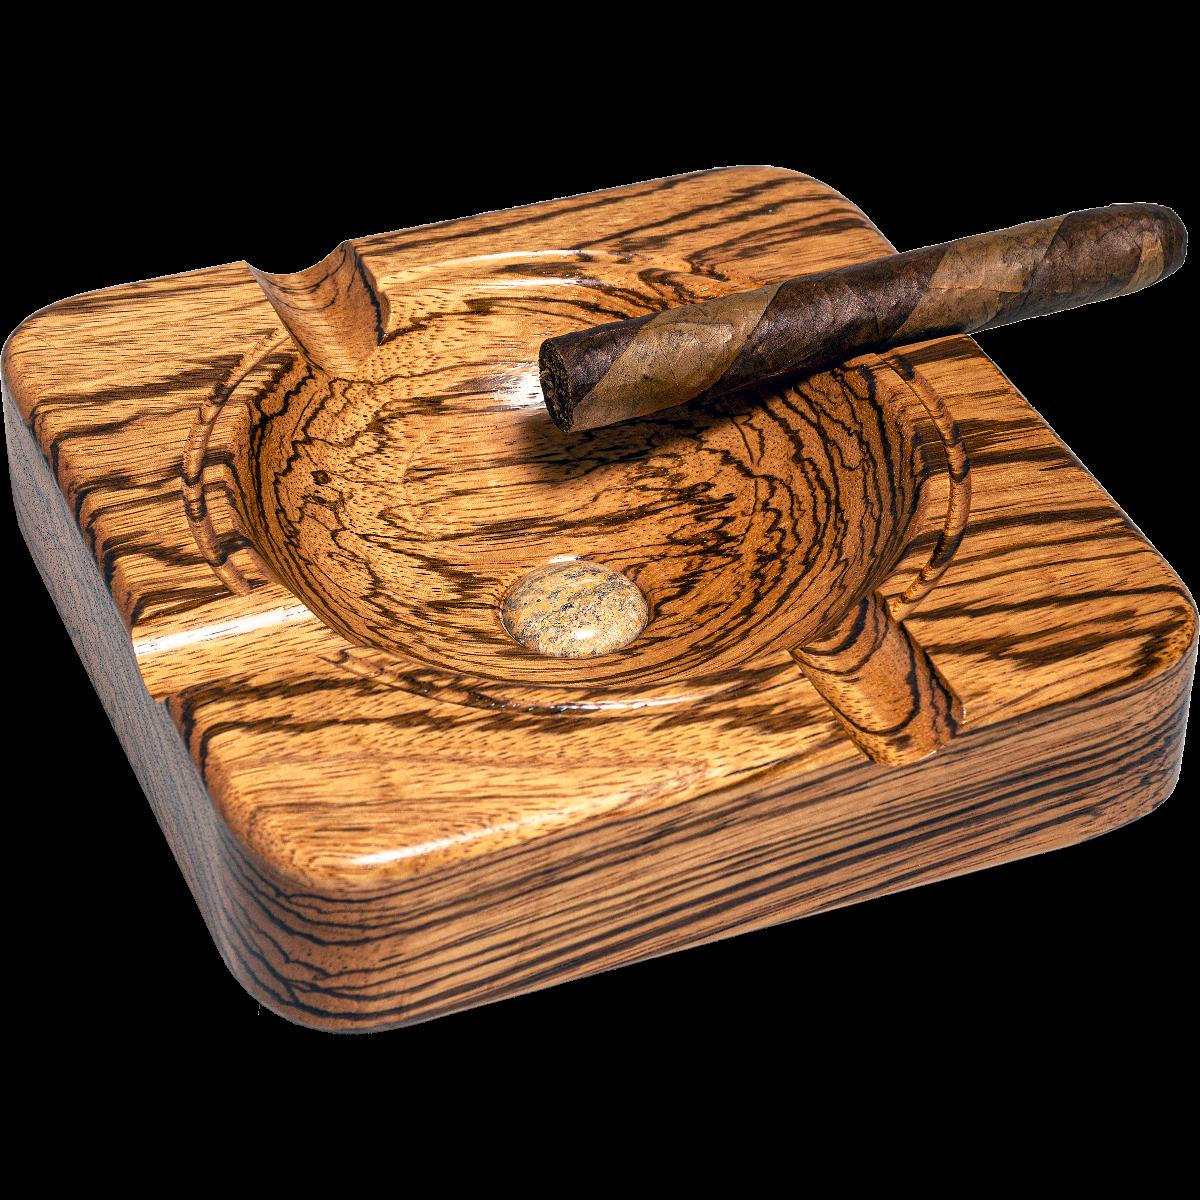 Decor Carbon Fiber Patterned Wooden Cigar Ashtray with 4-Cigar Rests Gift